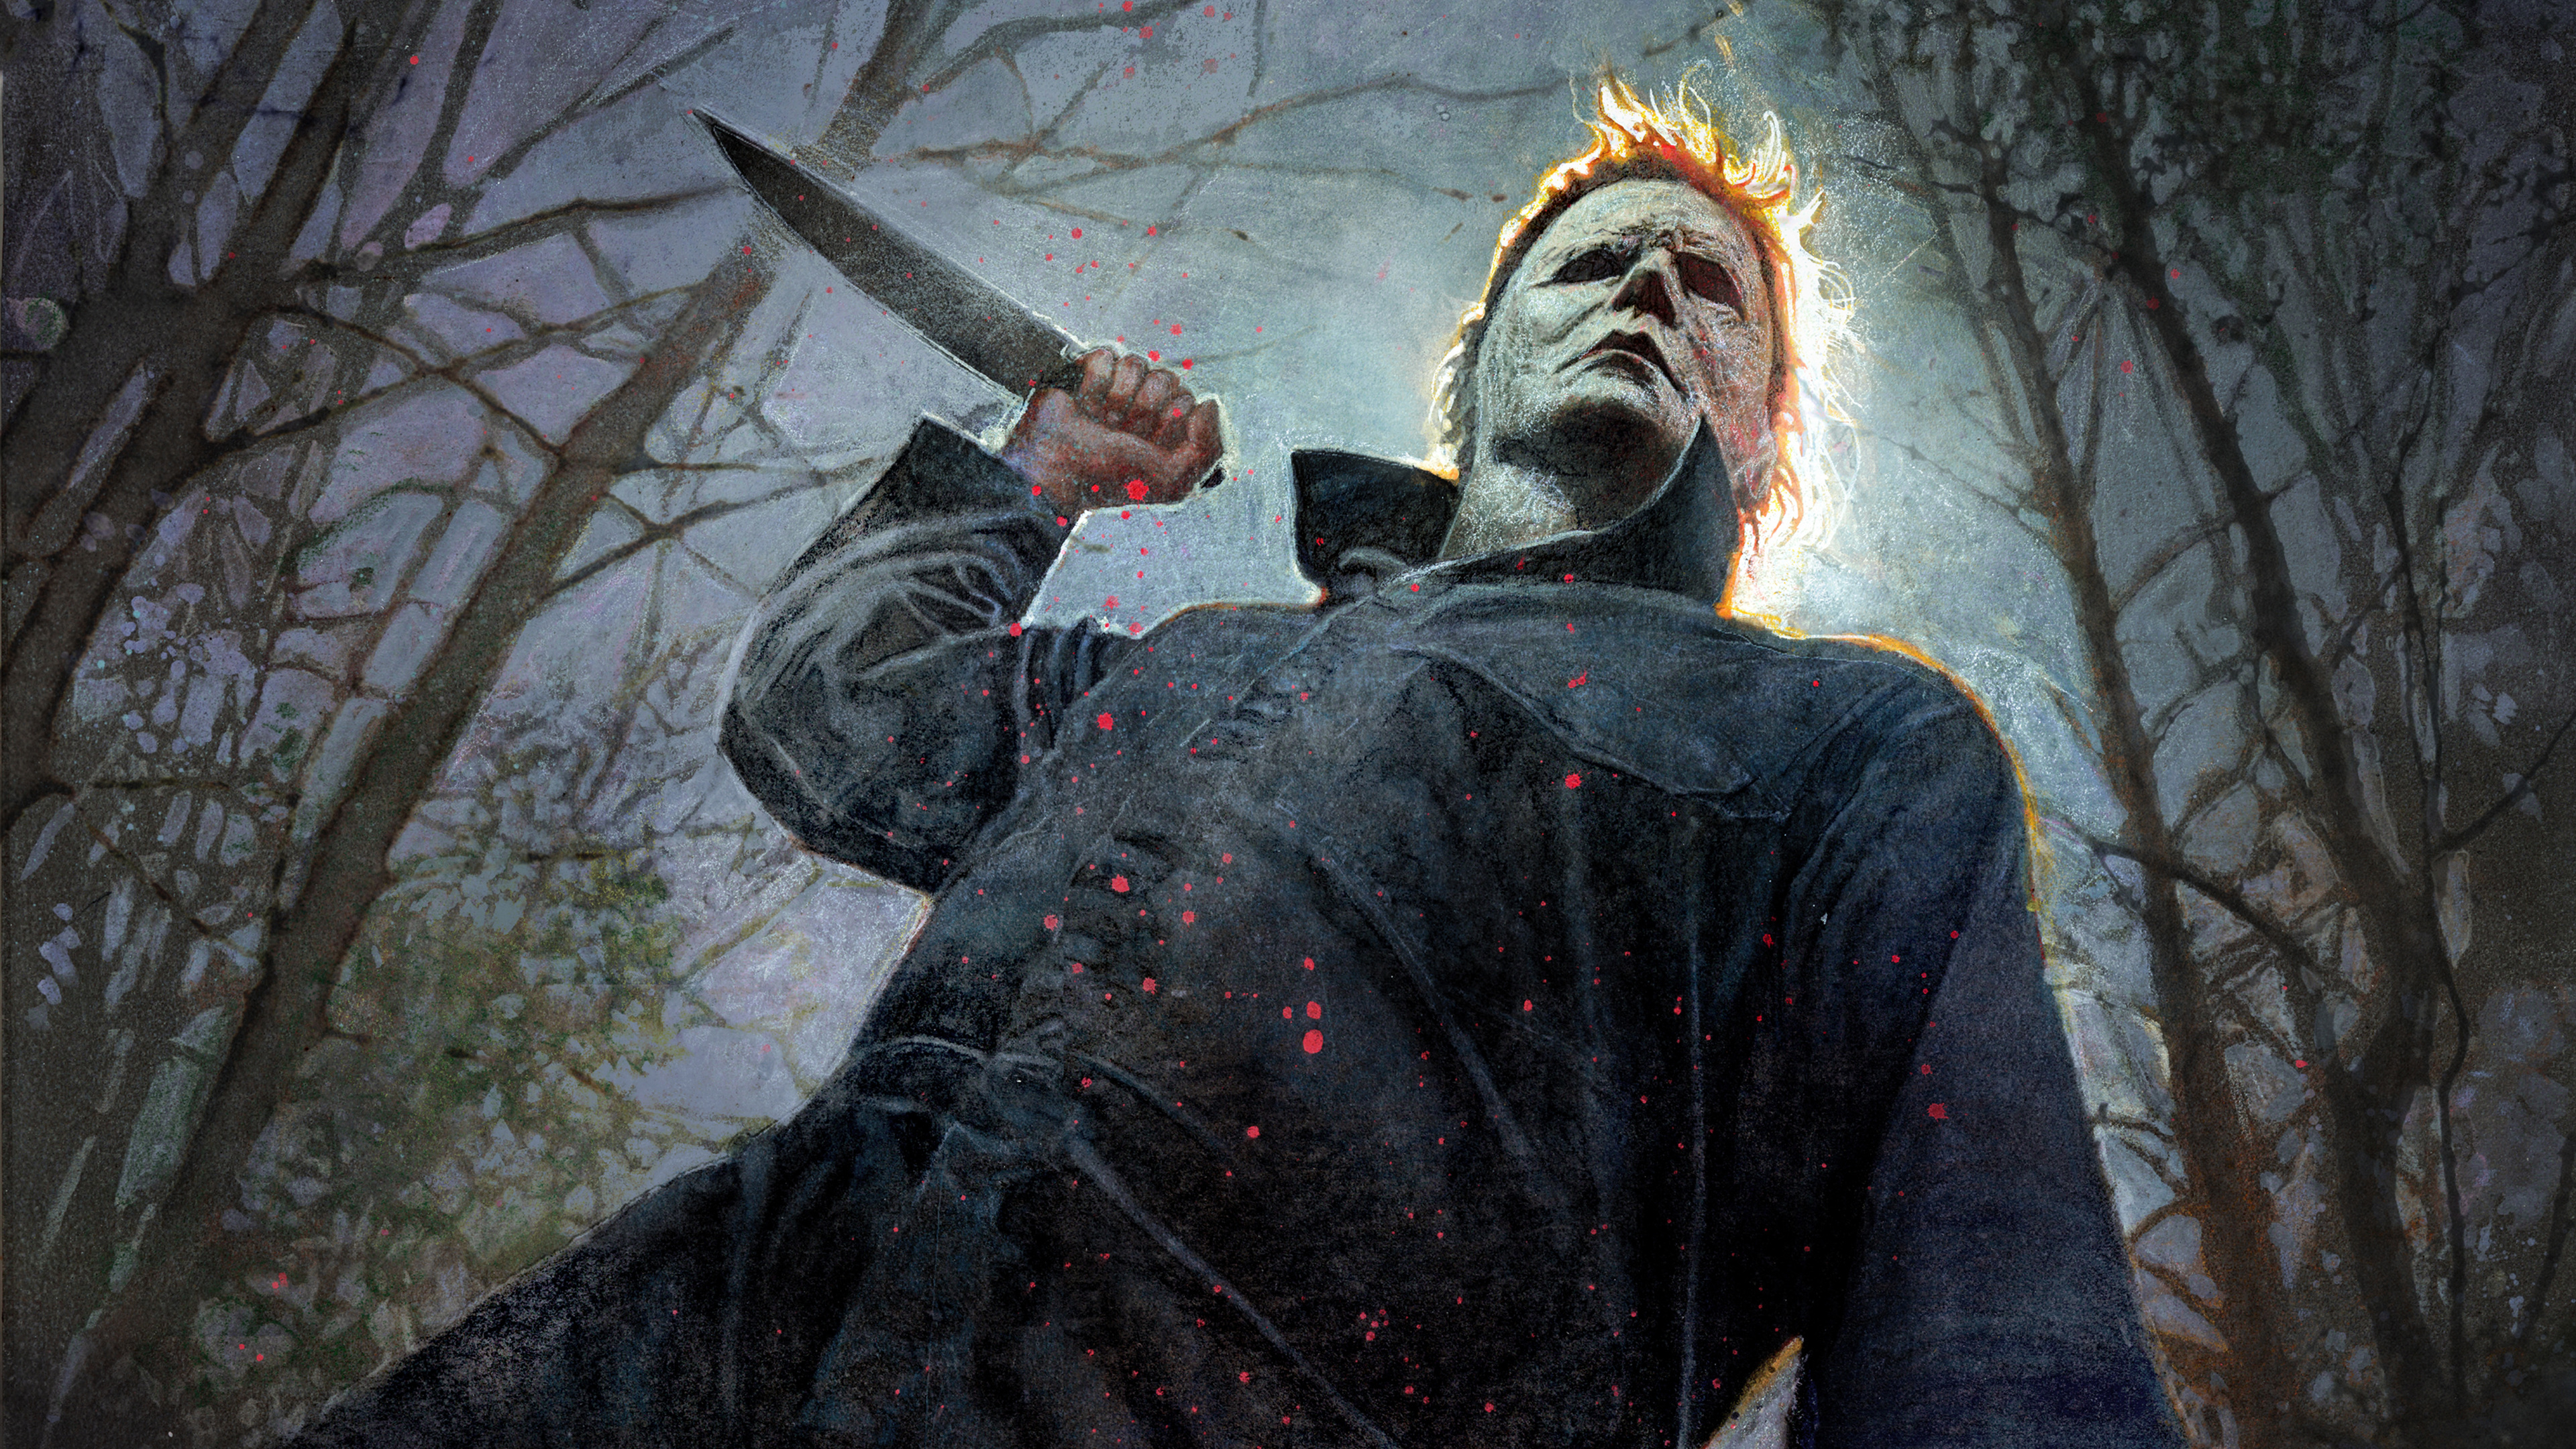 Wallpaper 4k 2018 Halloween Movie 5k 2018 Movies Wallpapers